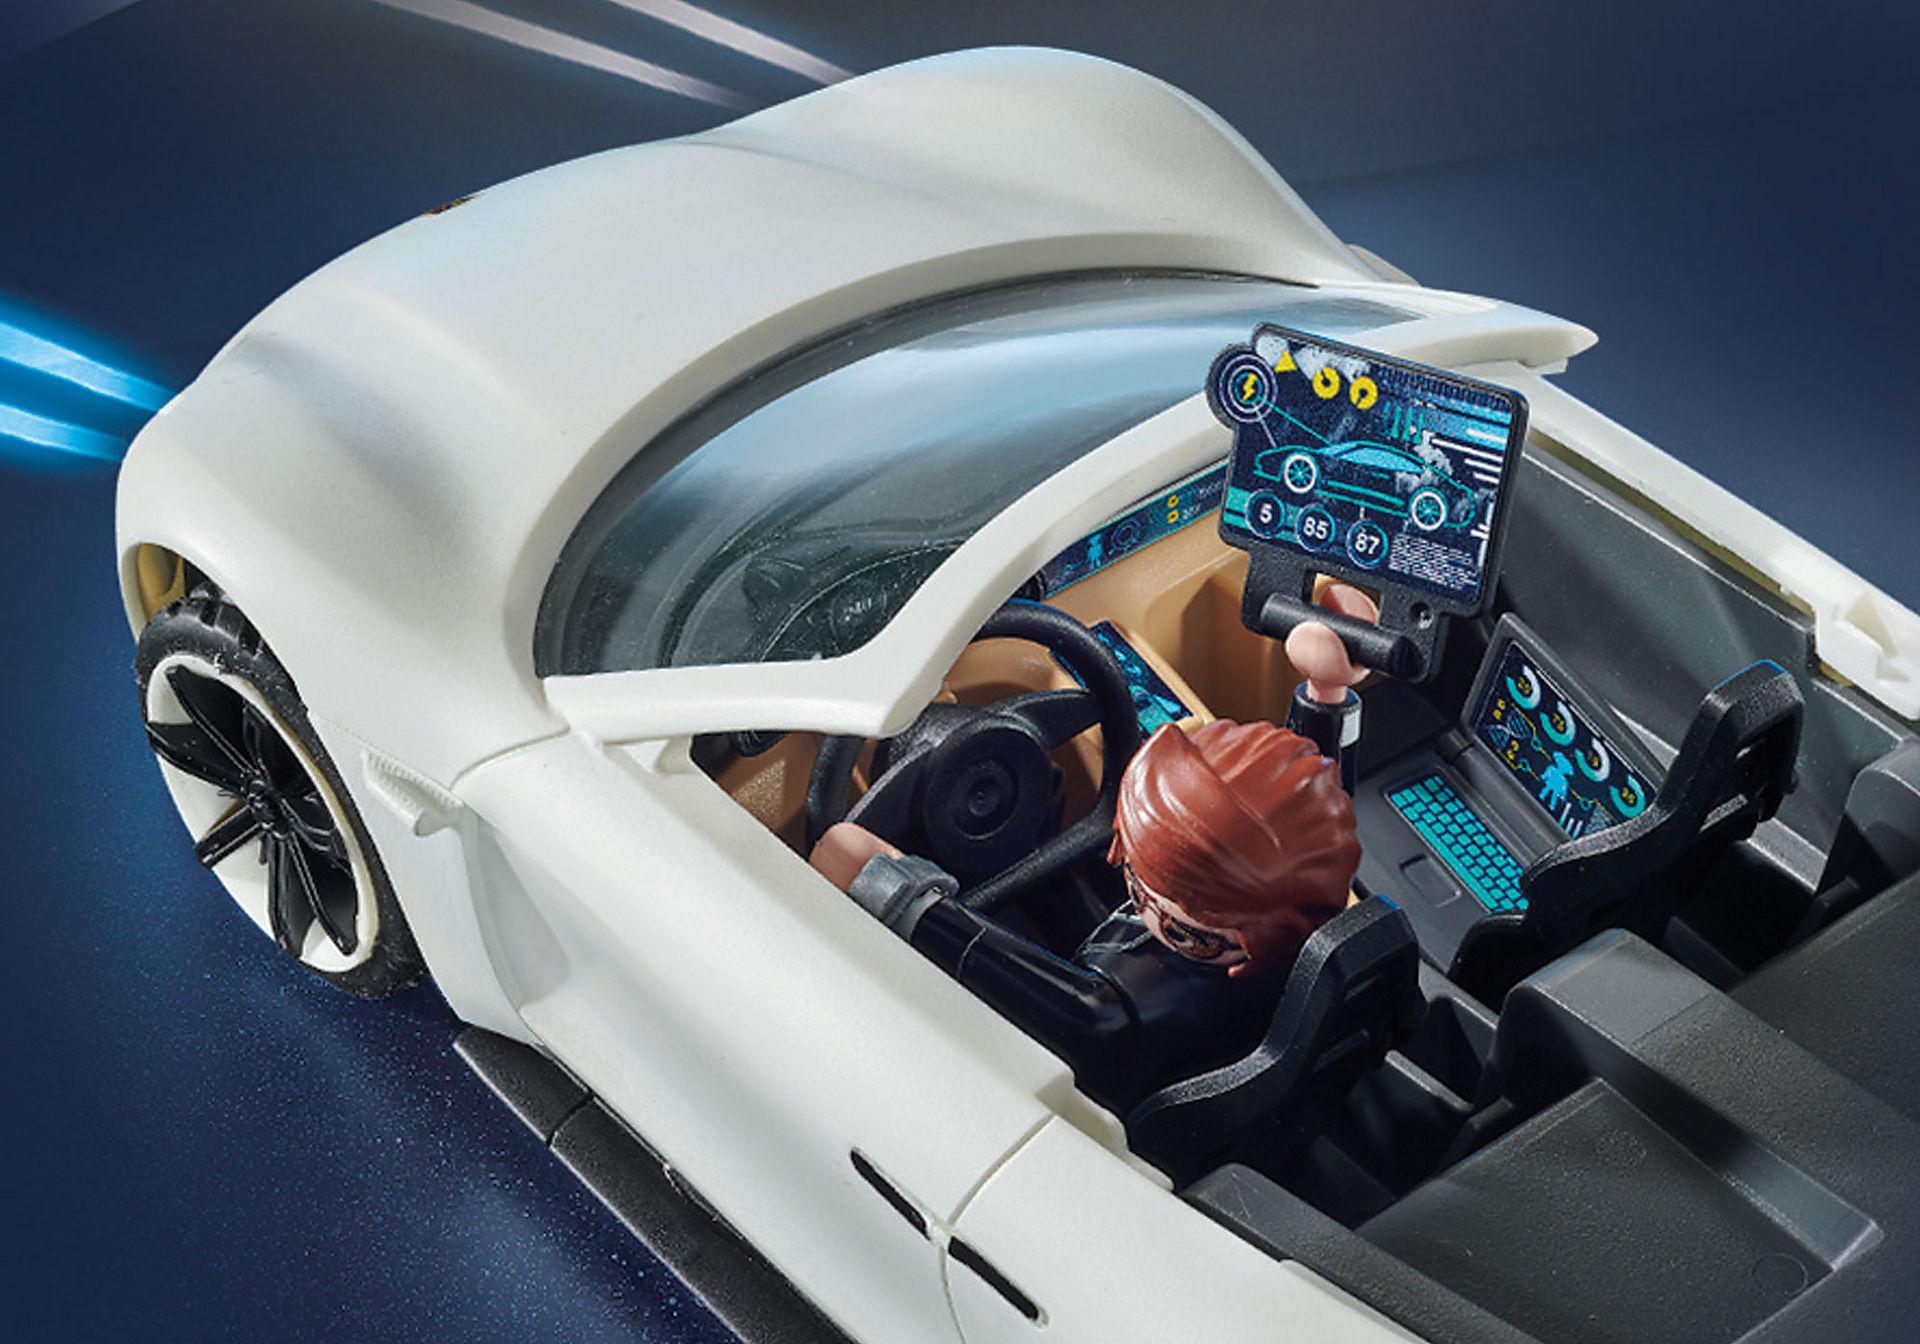 http://media.playmobil.com/i/playmobil/70078_product_extra4/PLAYMOBIL: THE MOVIE Porsche Mission E y Rex Dasher